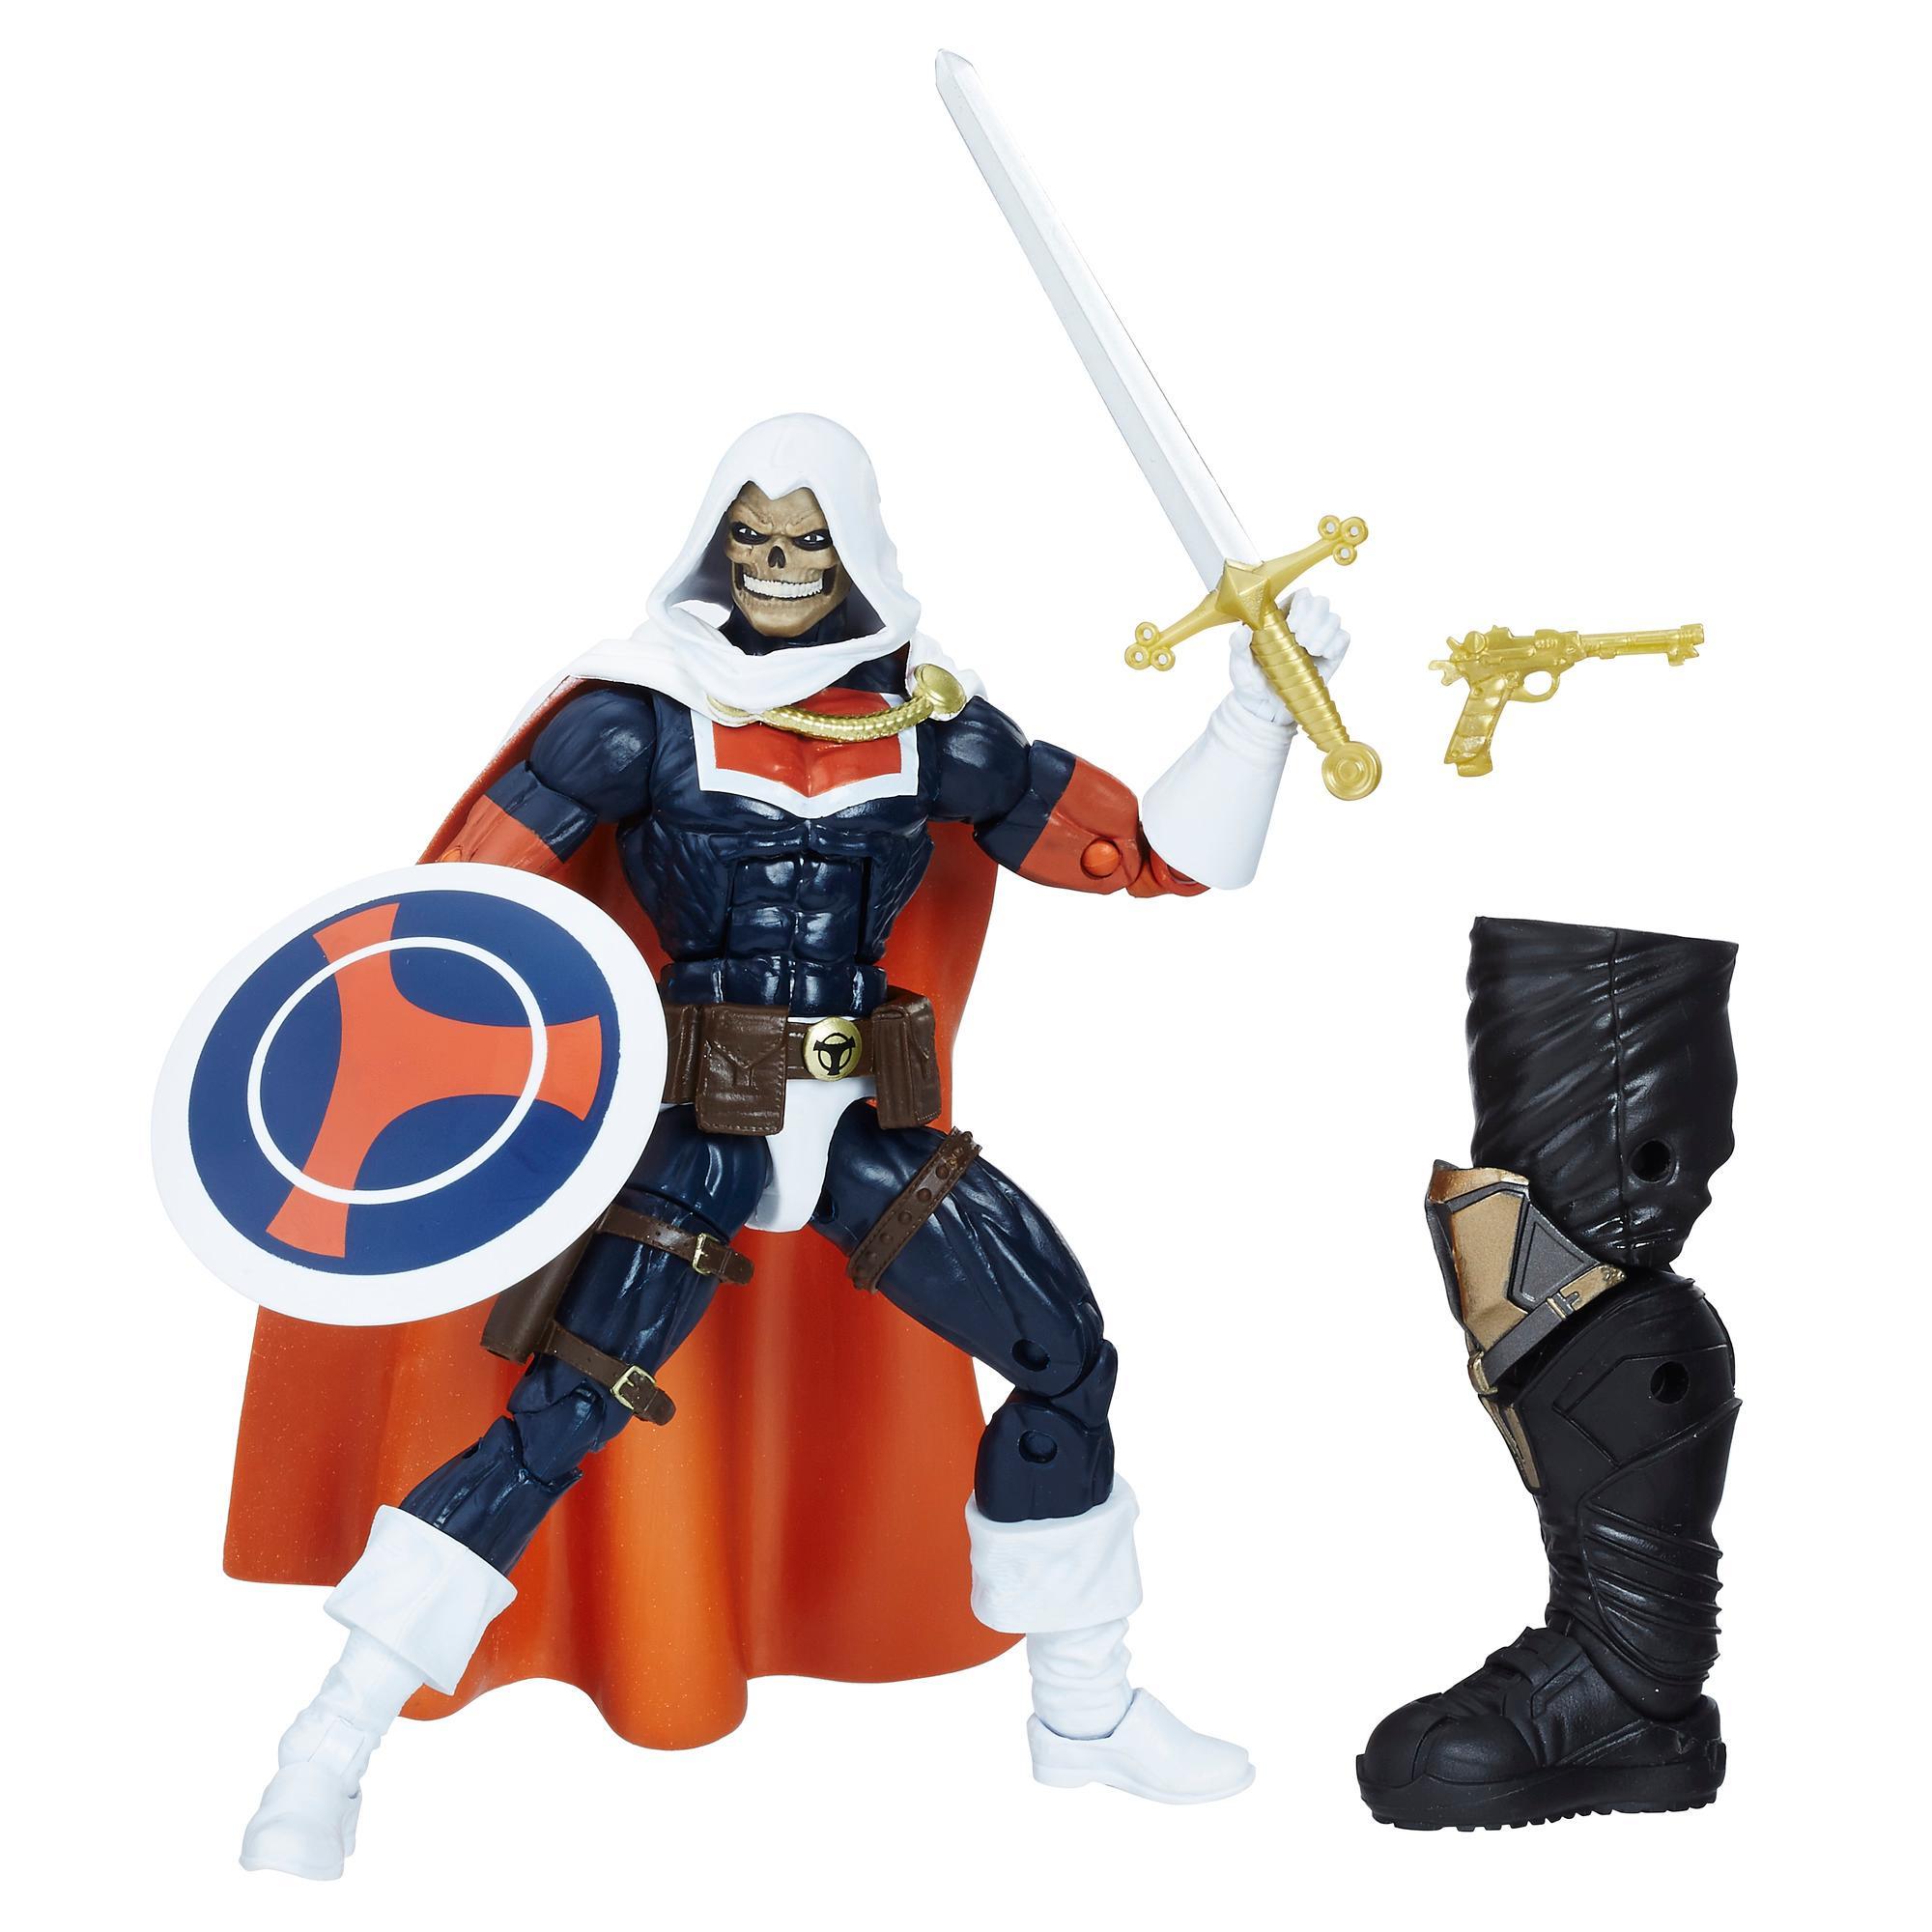 Avengers série Marvel Legends - Figurine Taskmaster de 15 cm